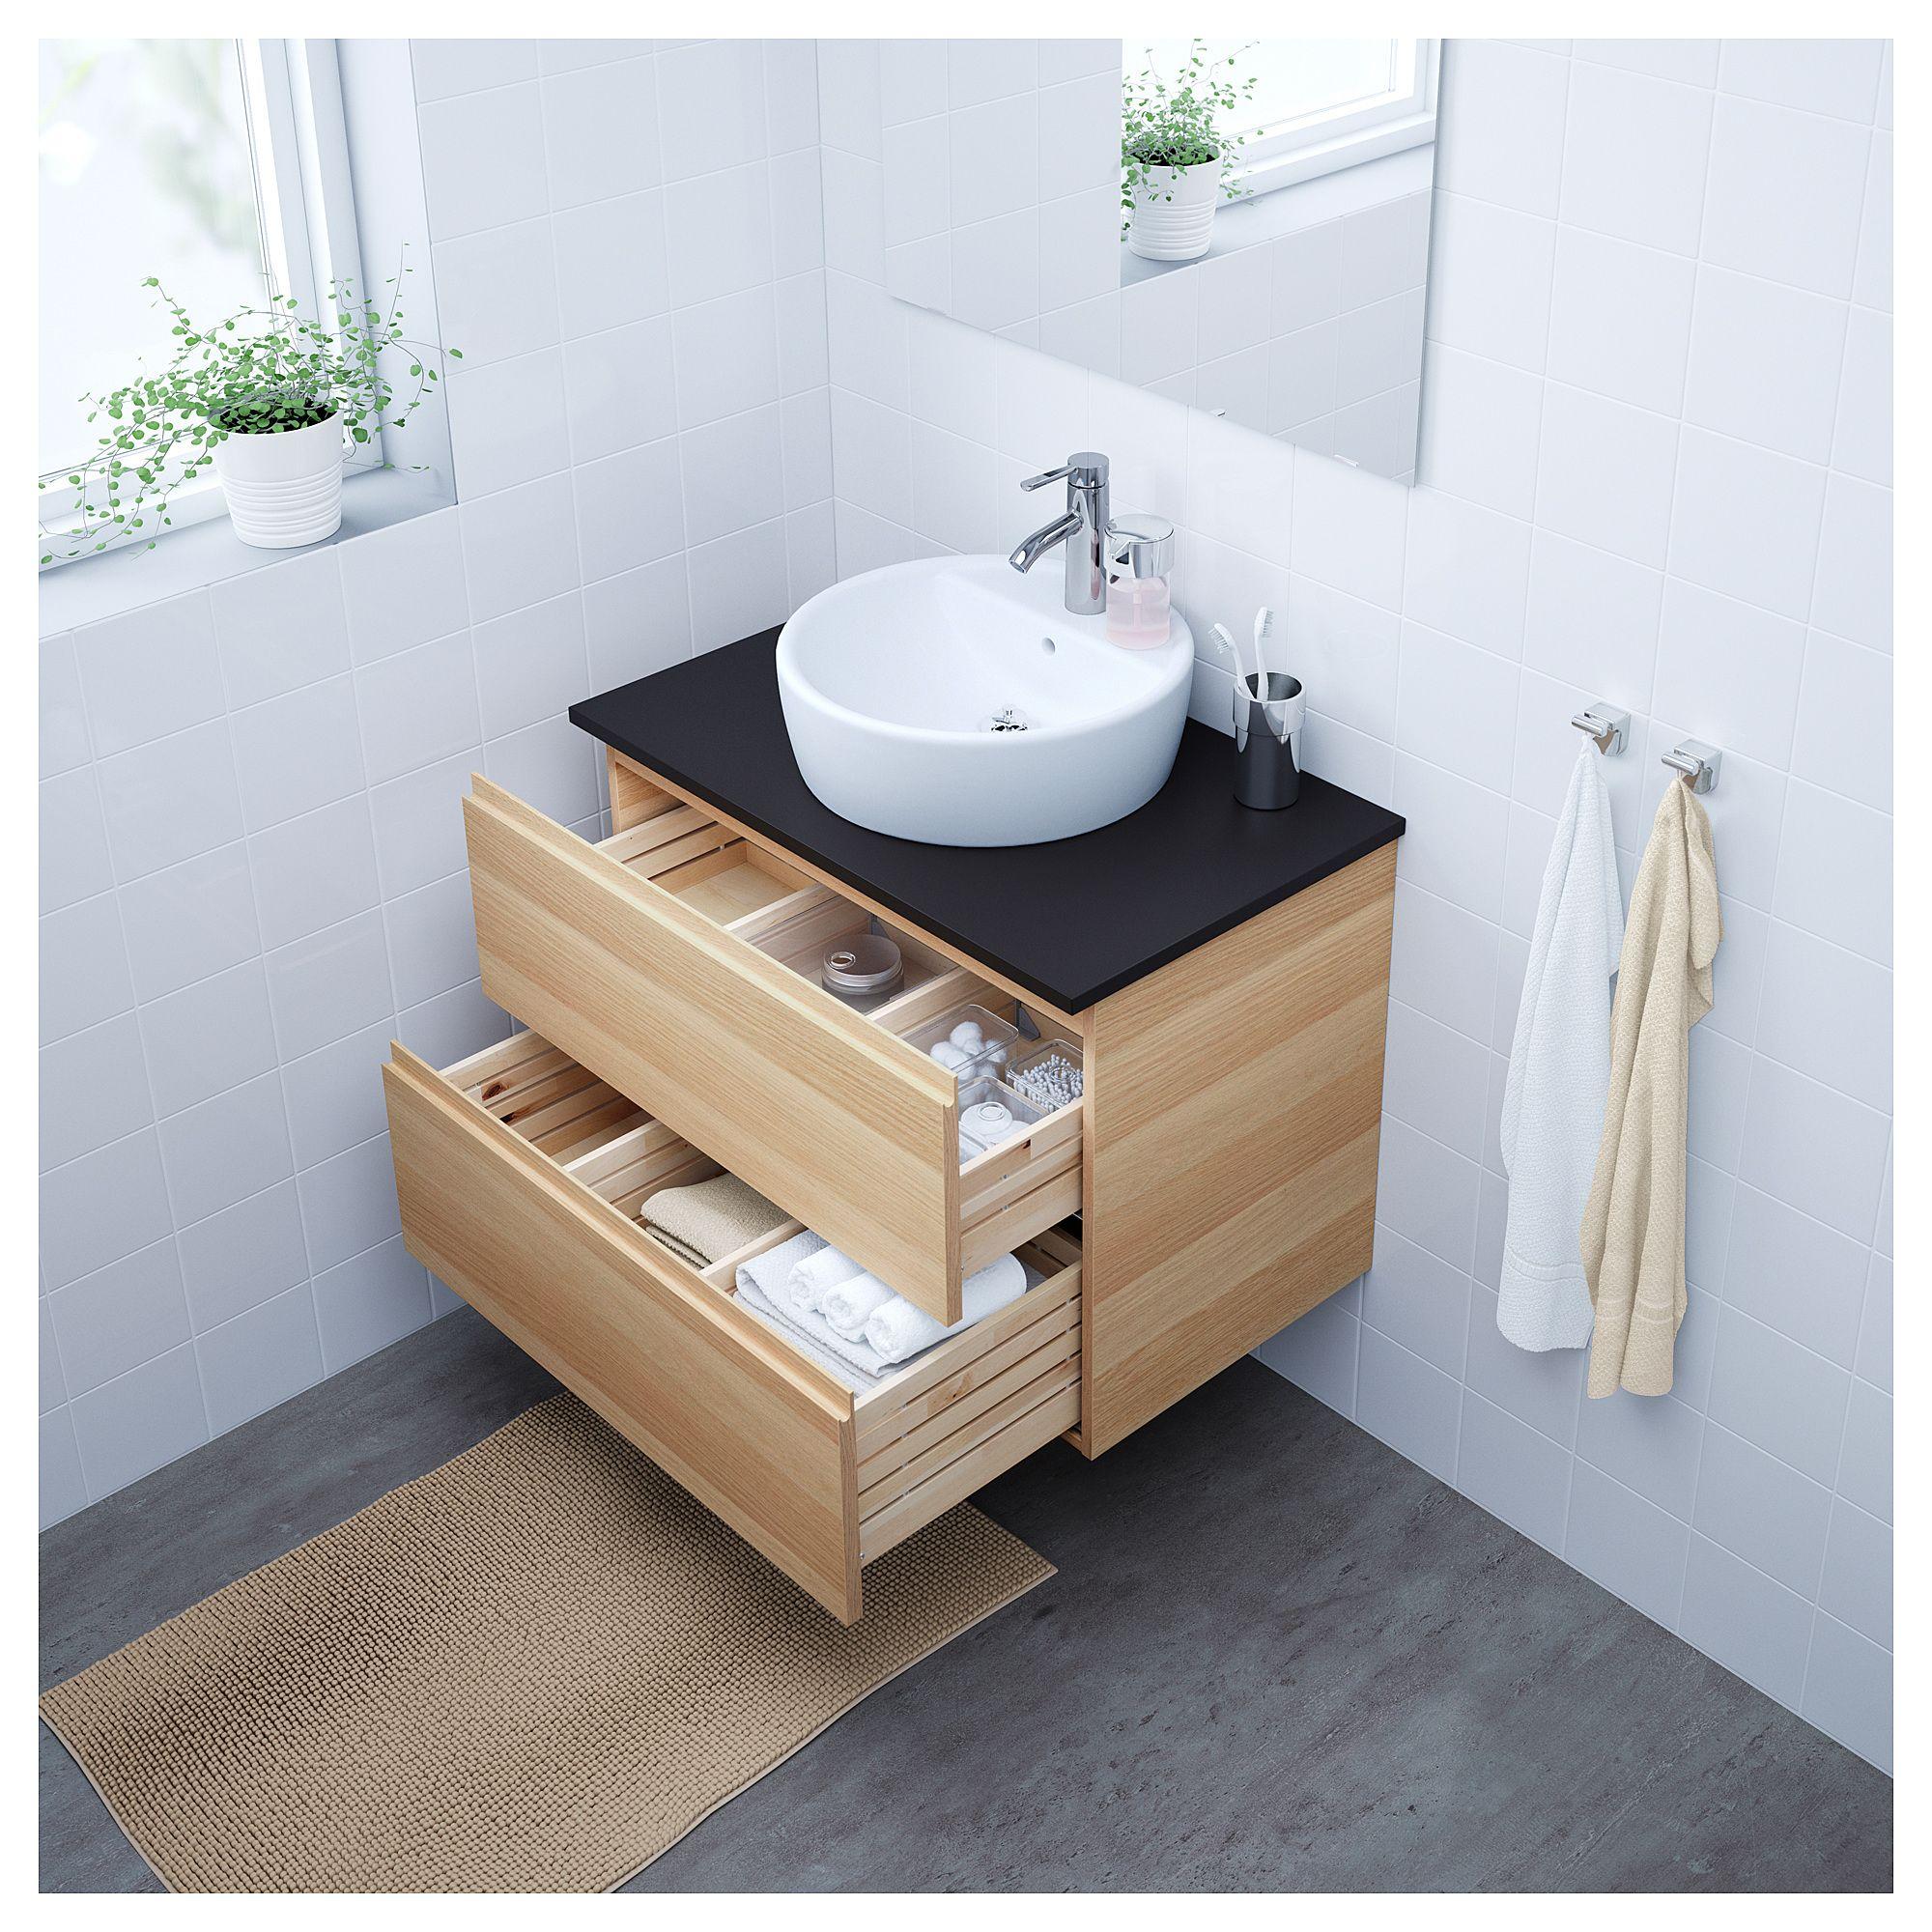 Furniture And Home Furnishings Waschbeckenschrank Badezimmer Mobel Weiss Ikea Godmorgon